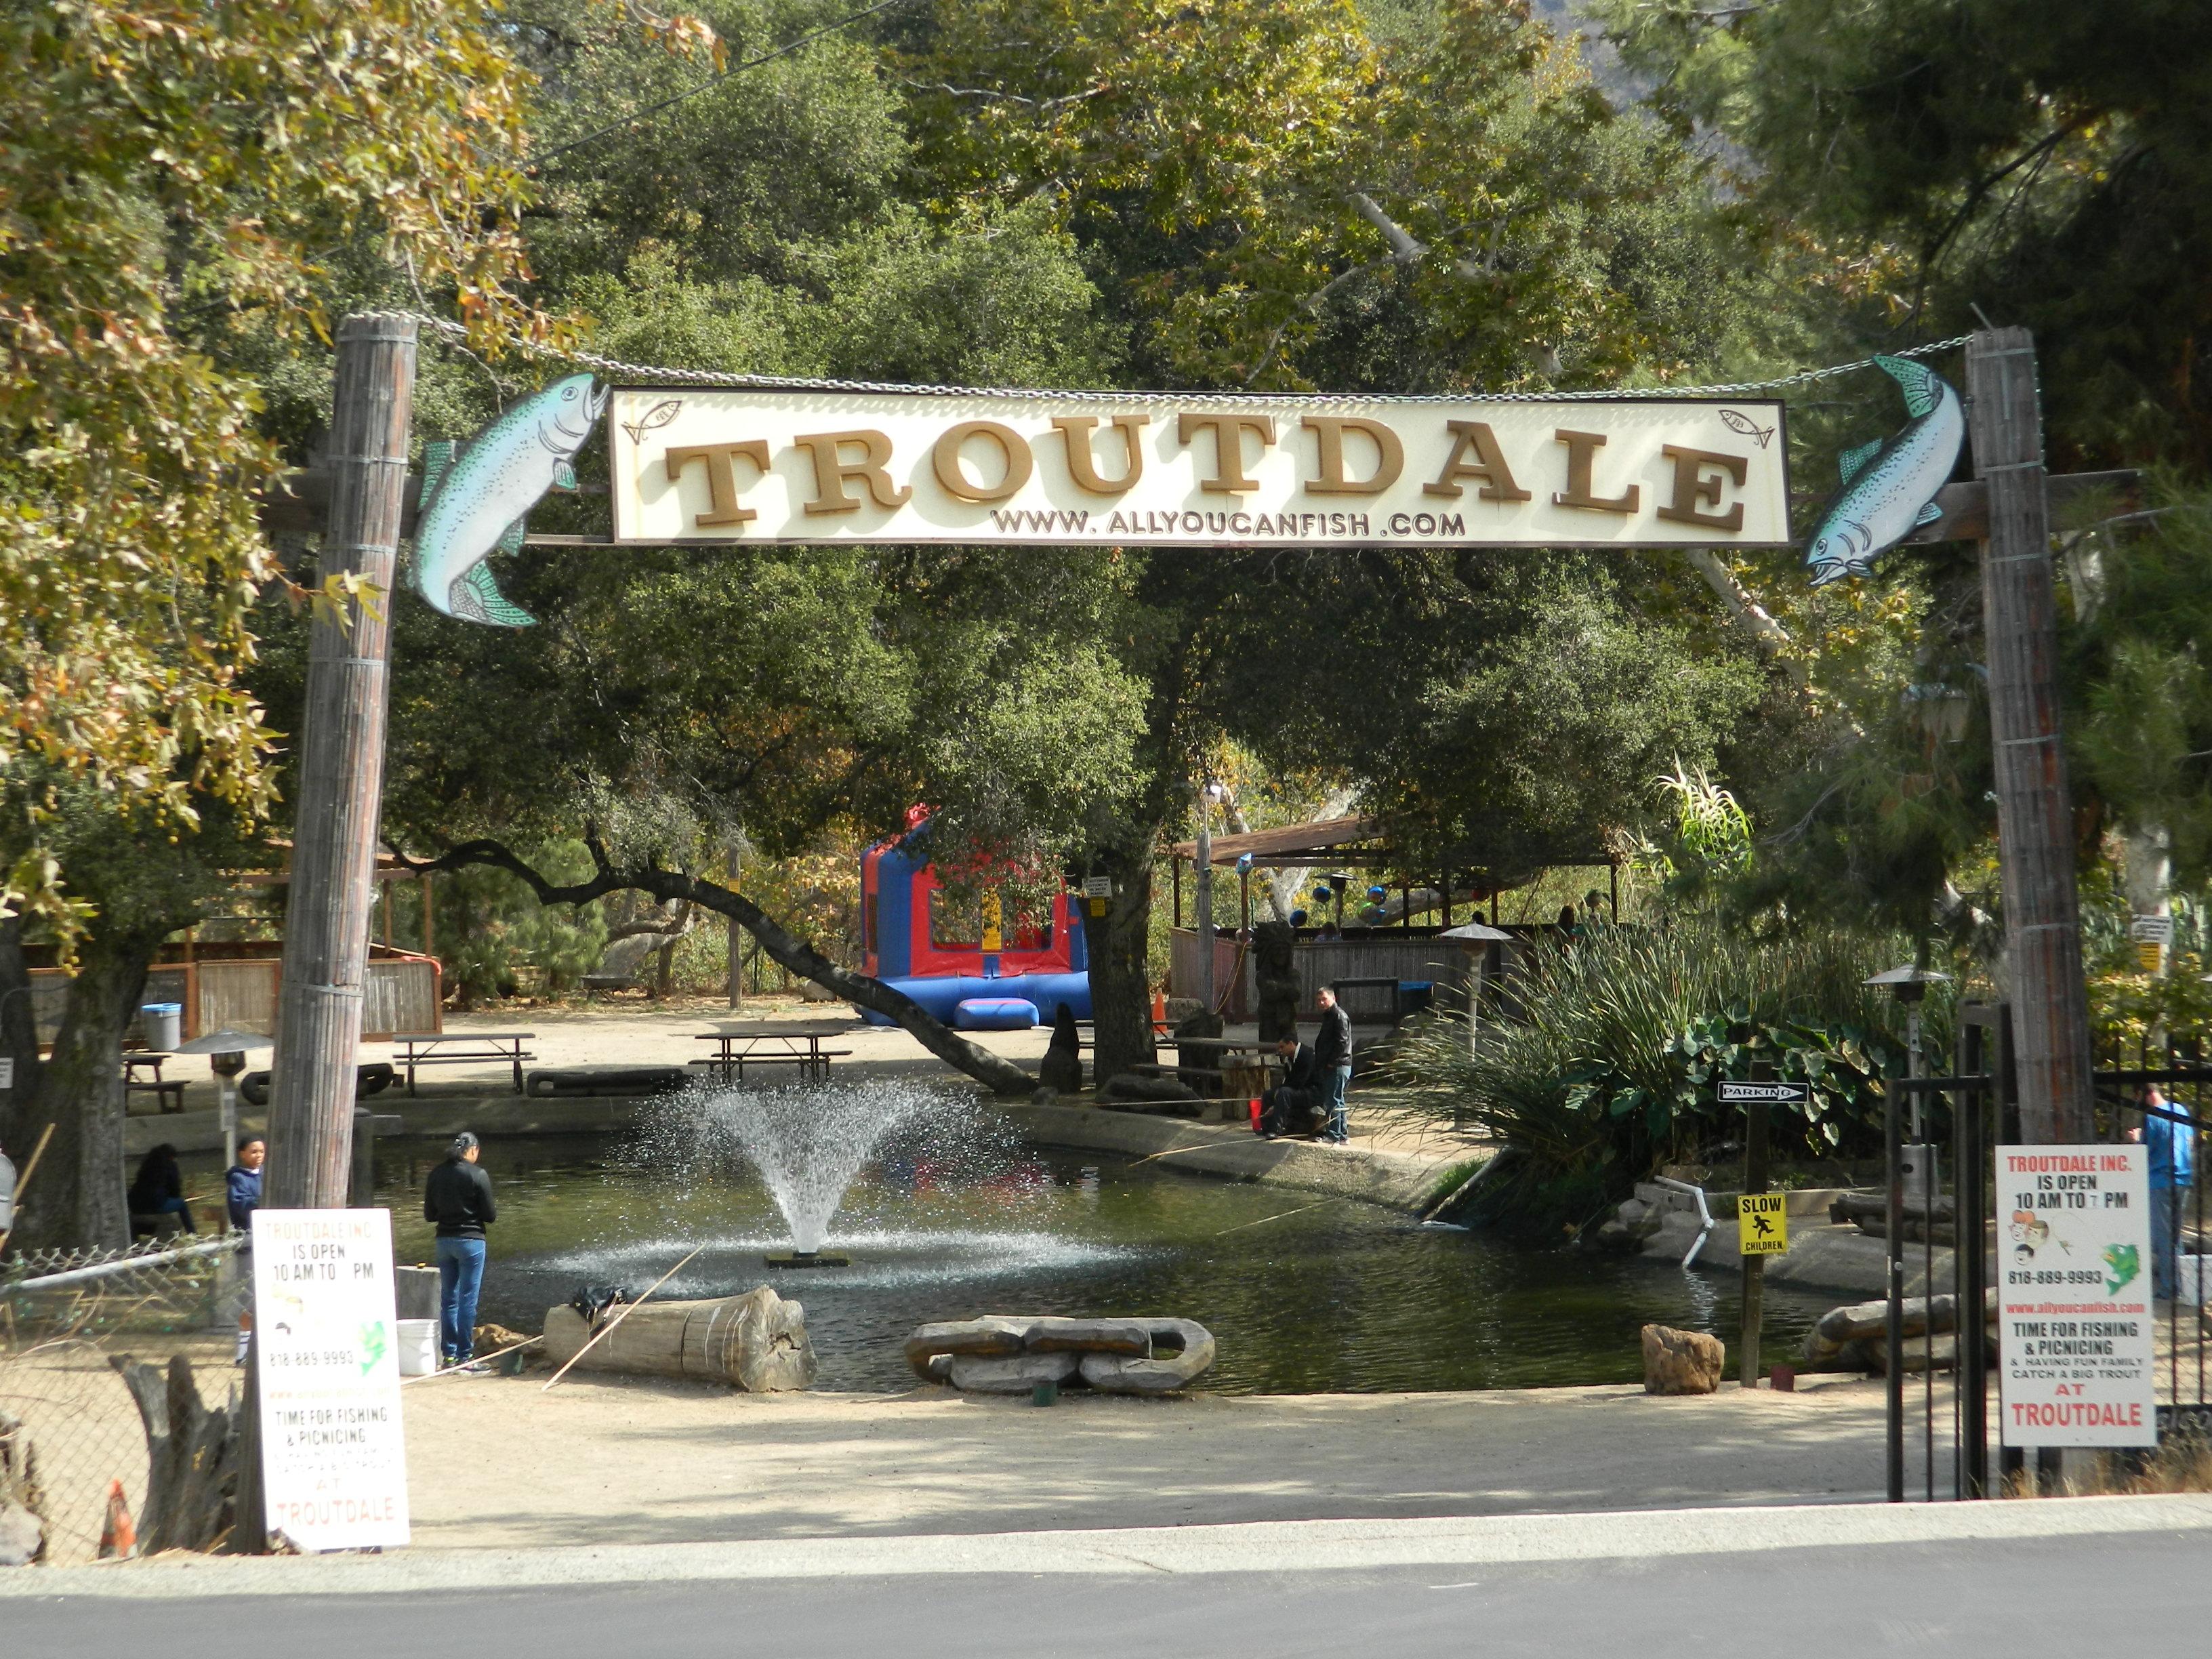 REDTRI-troutdale2-losangeles